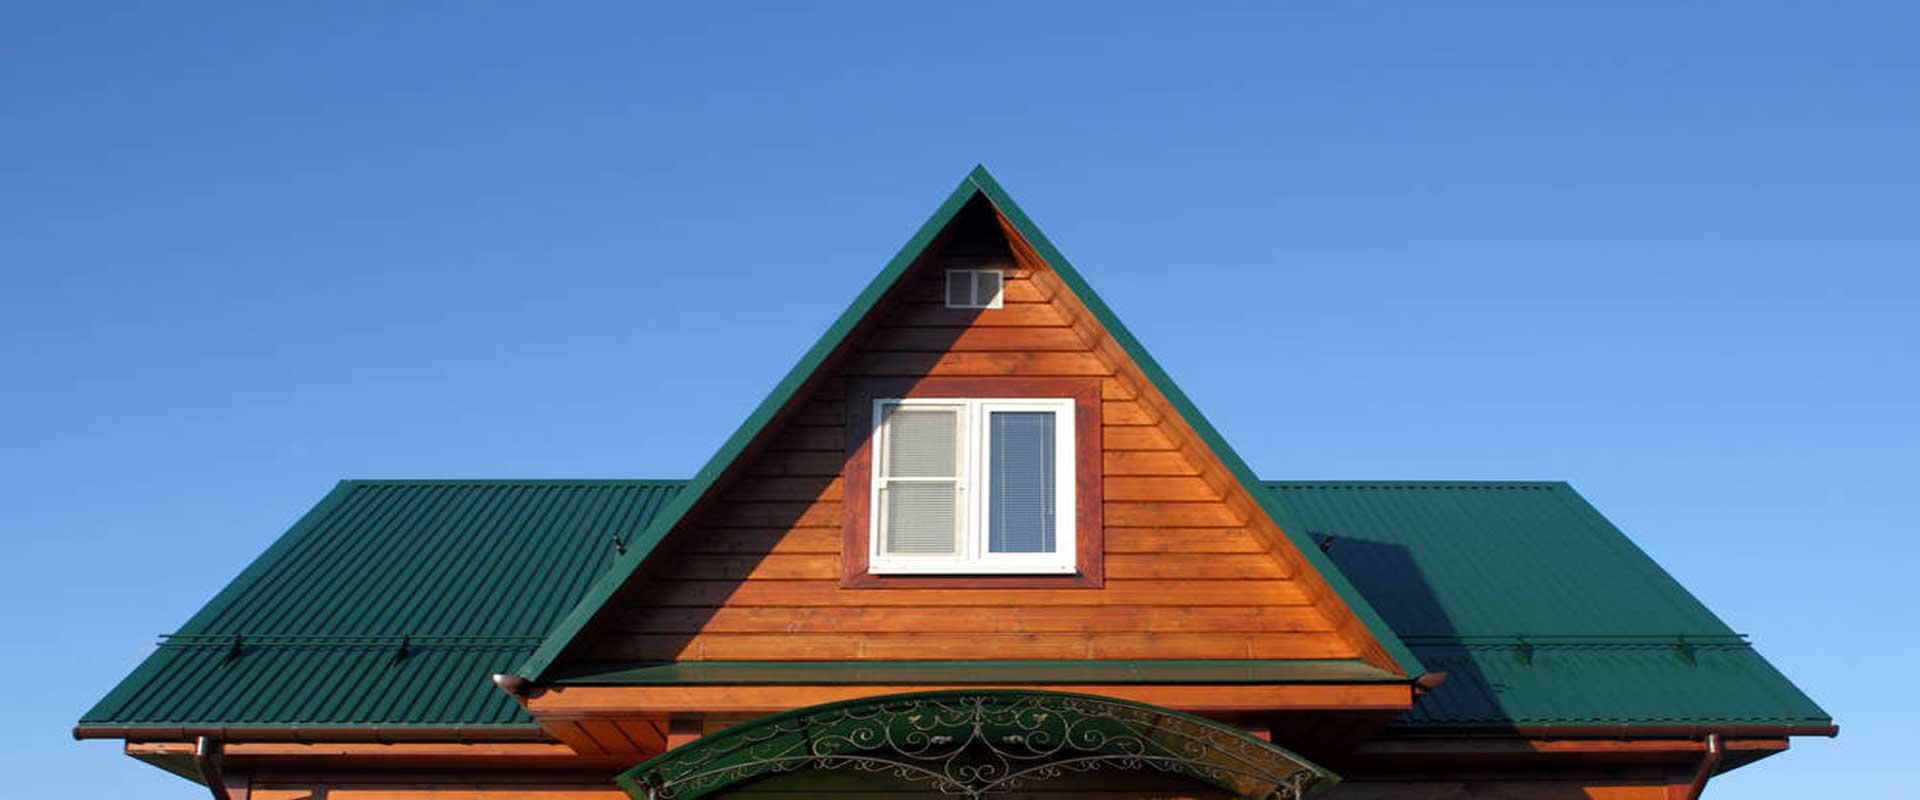 Cedar Plank Roofing Contractors Boston Ma 617 631 9720